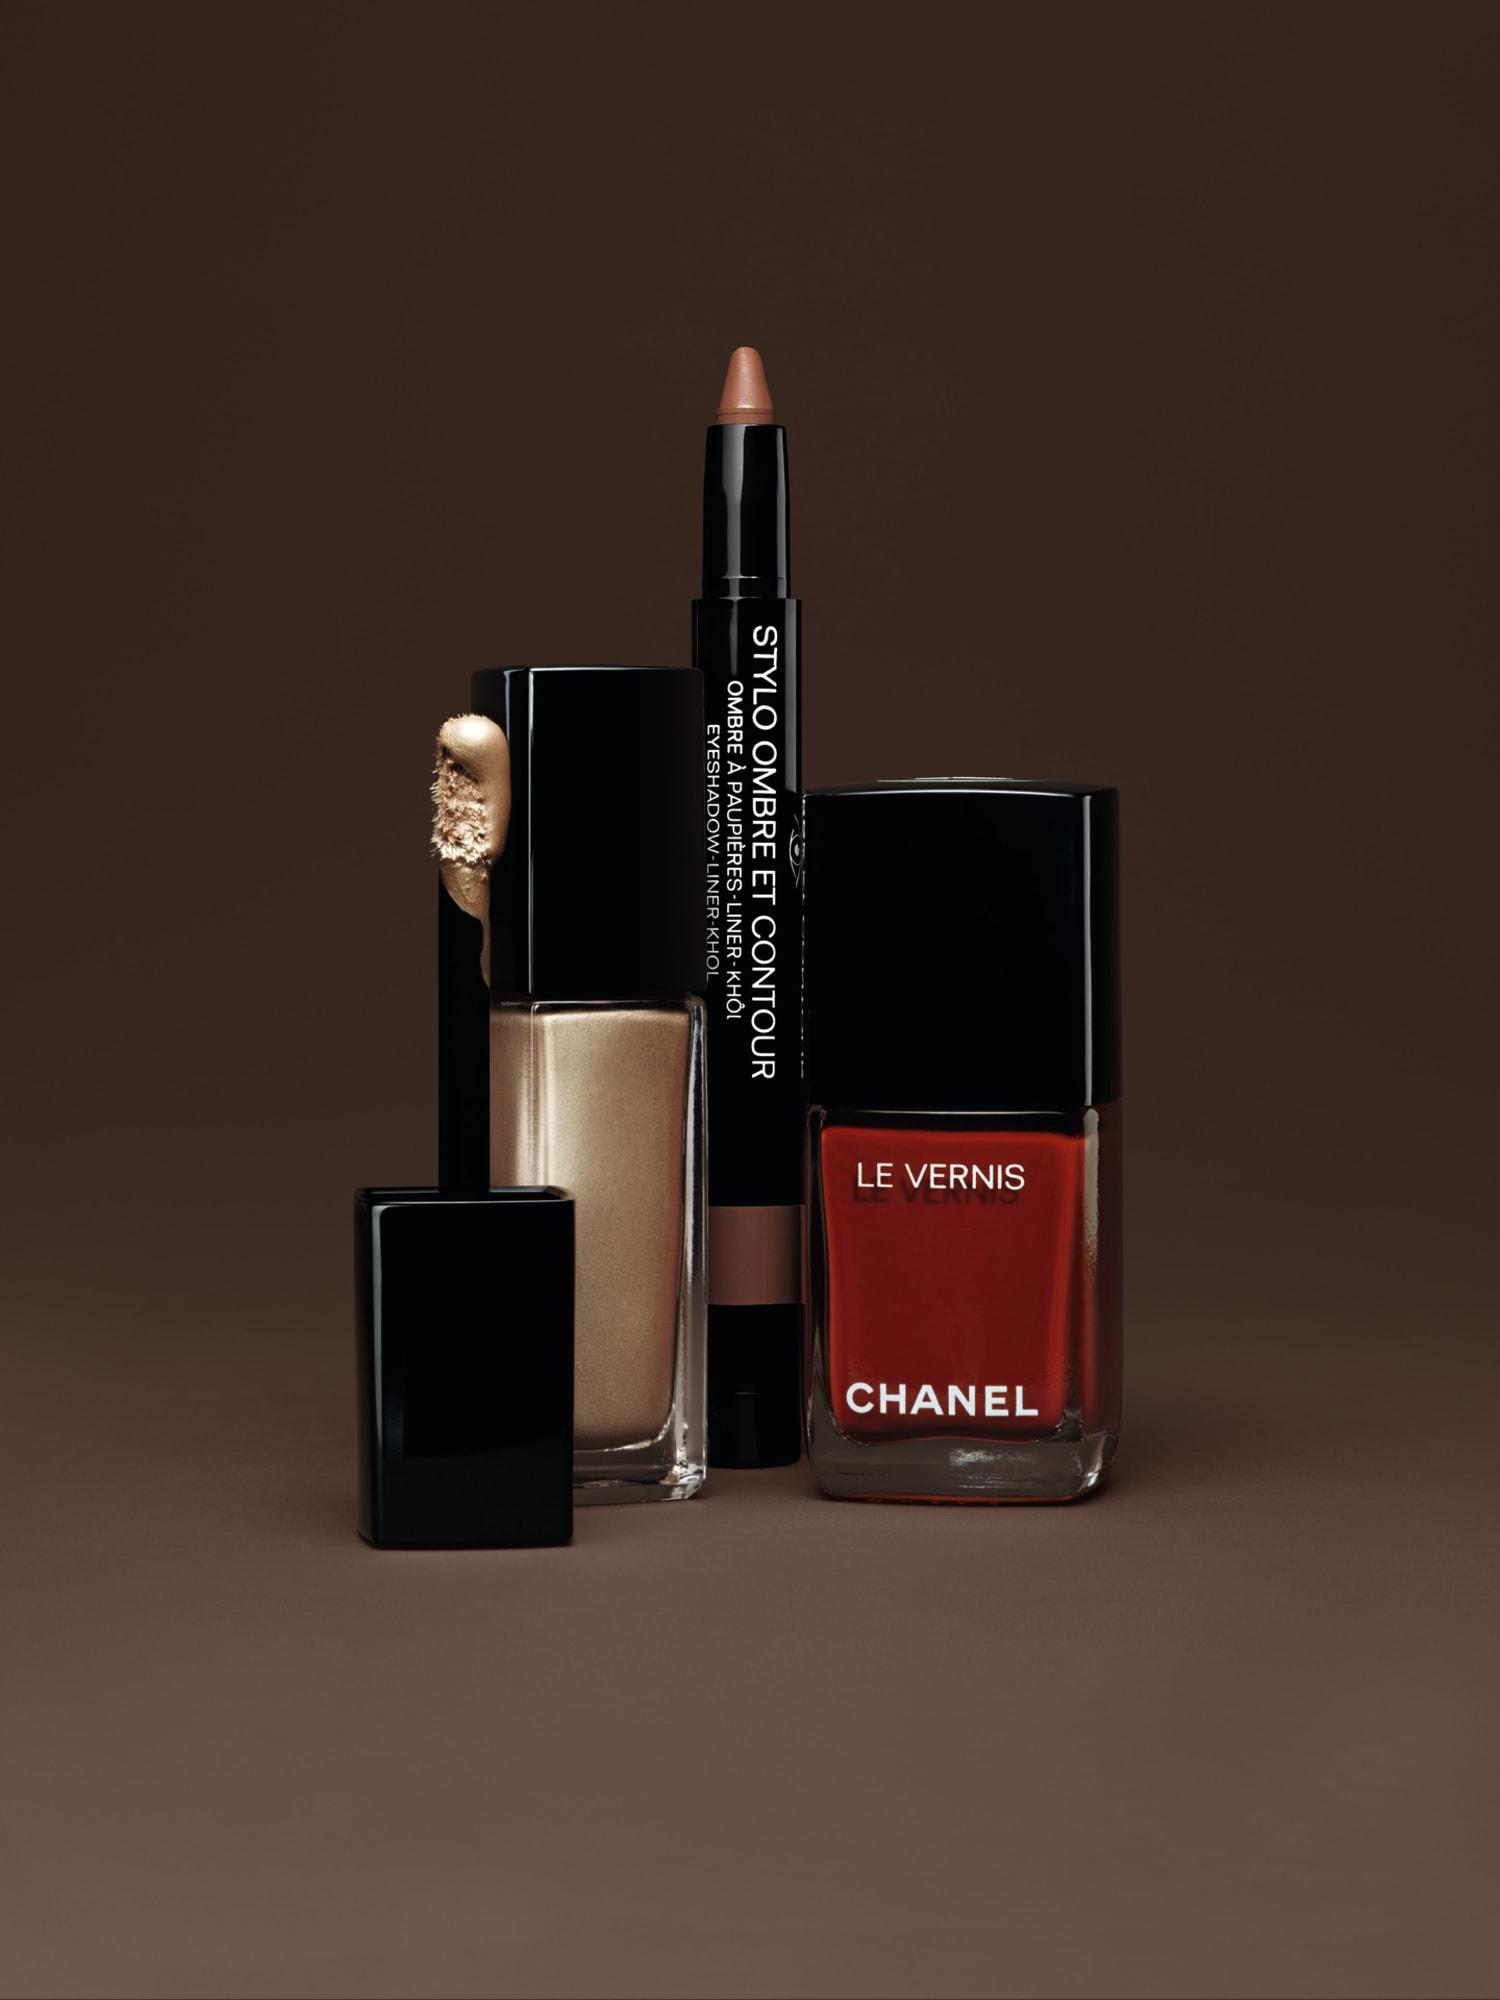 Chanel_FW21_Makeup_Fashionela (3)